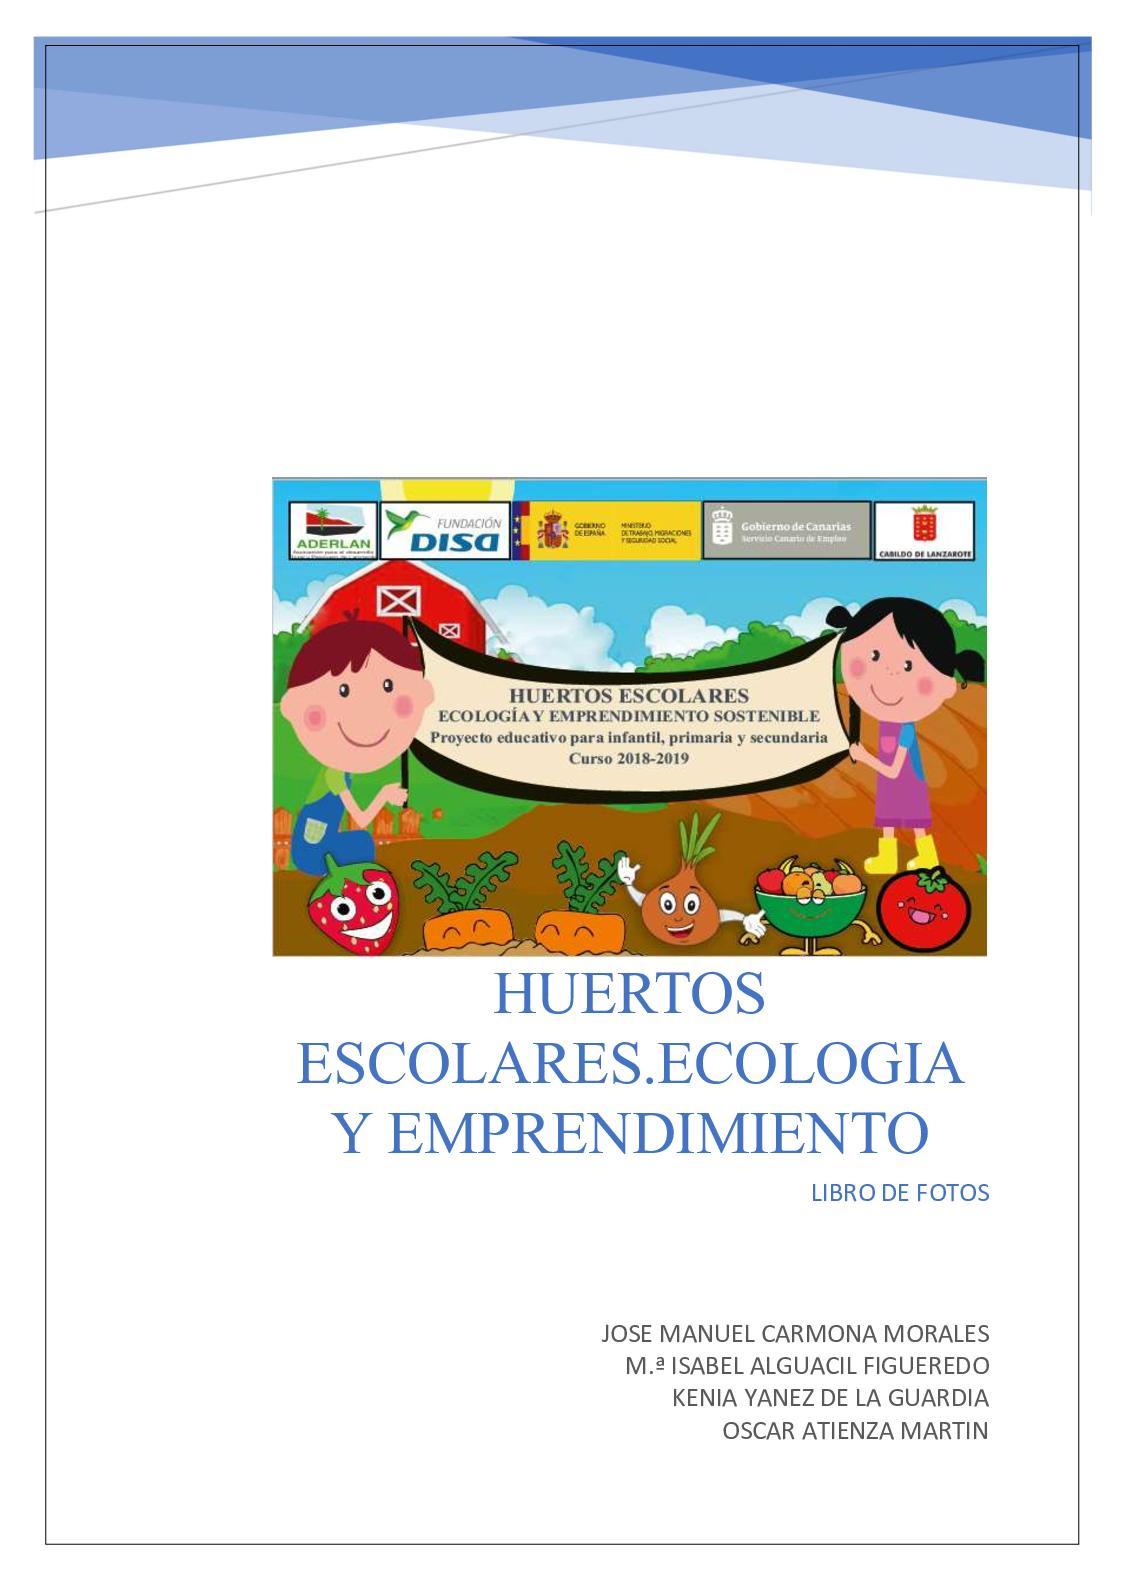 Huertos Escolares 2018/2019. Libro de Fotos